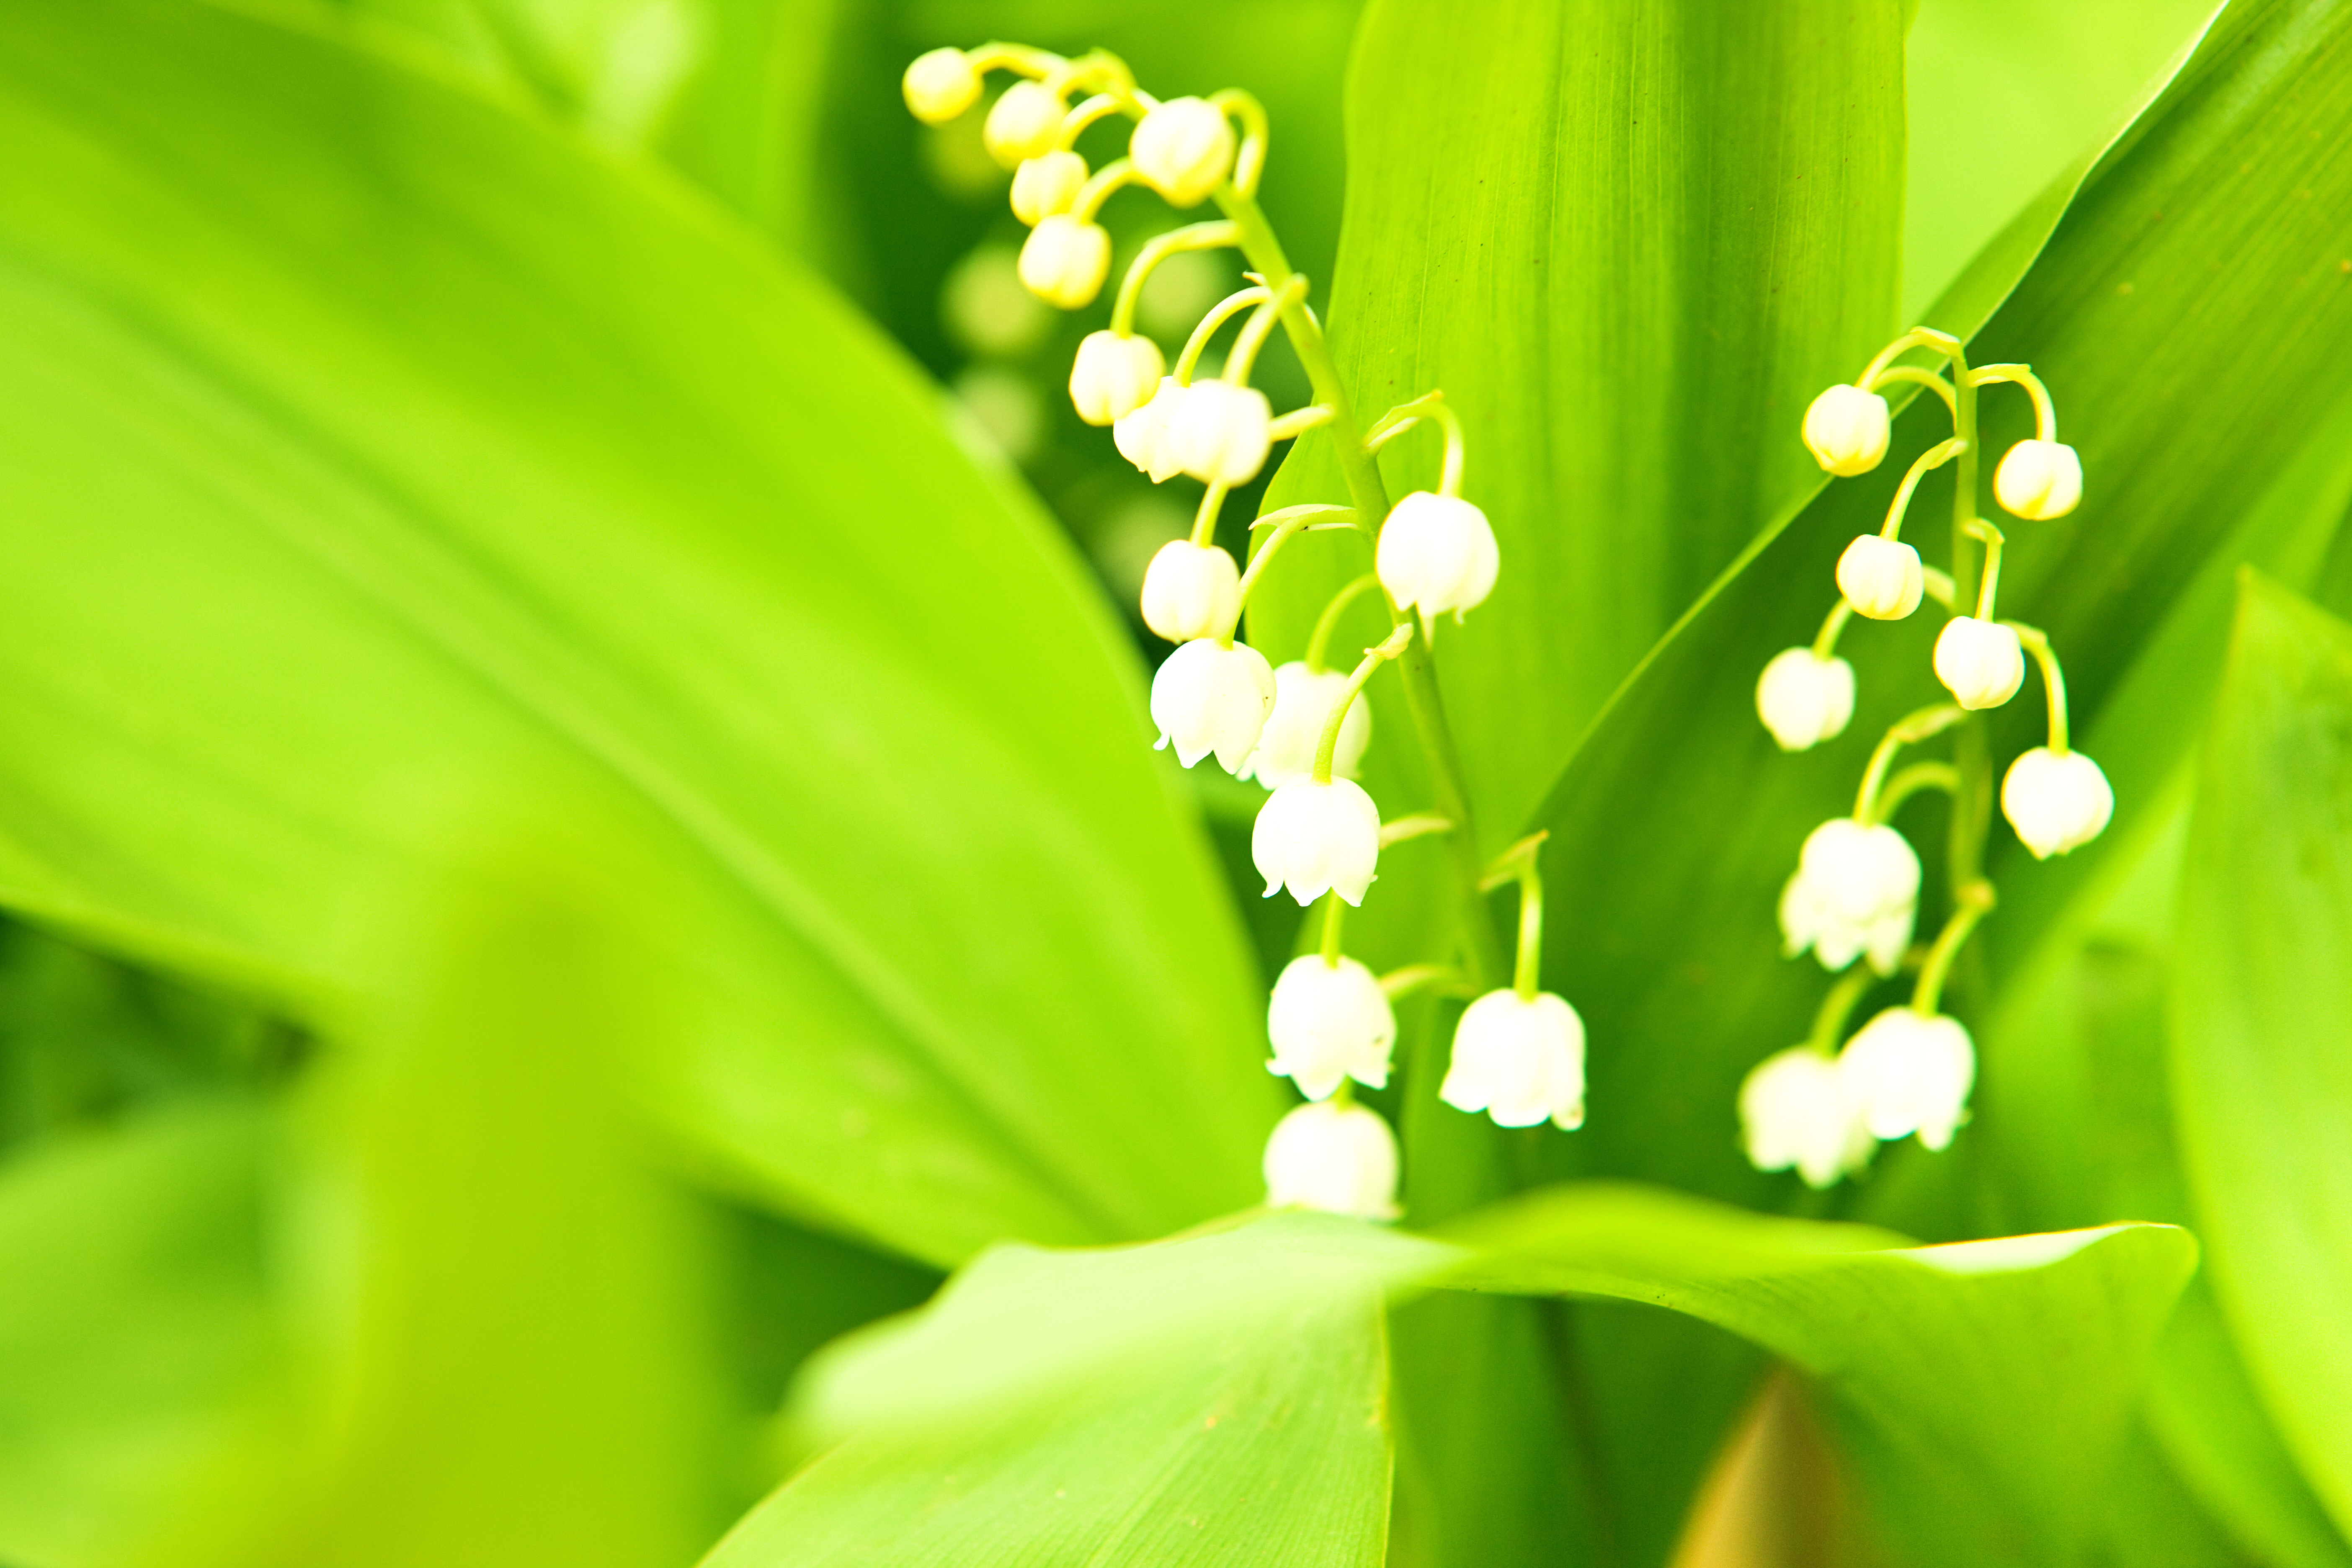 White flower on green photo